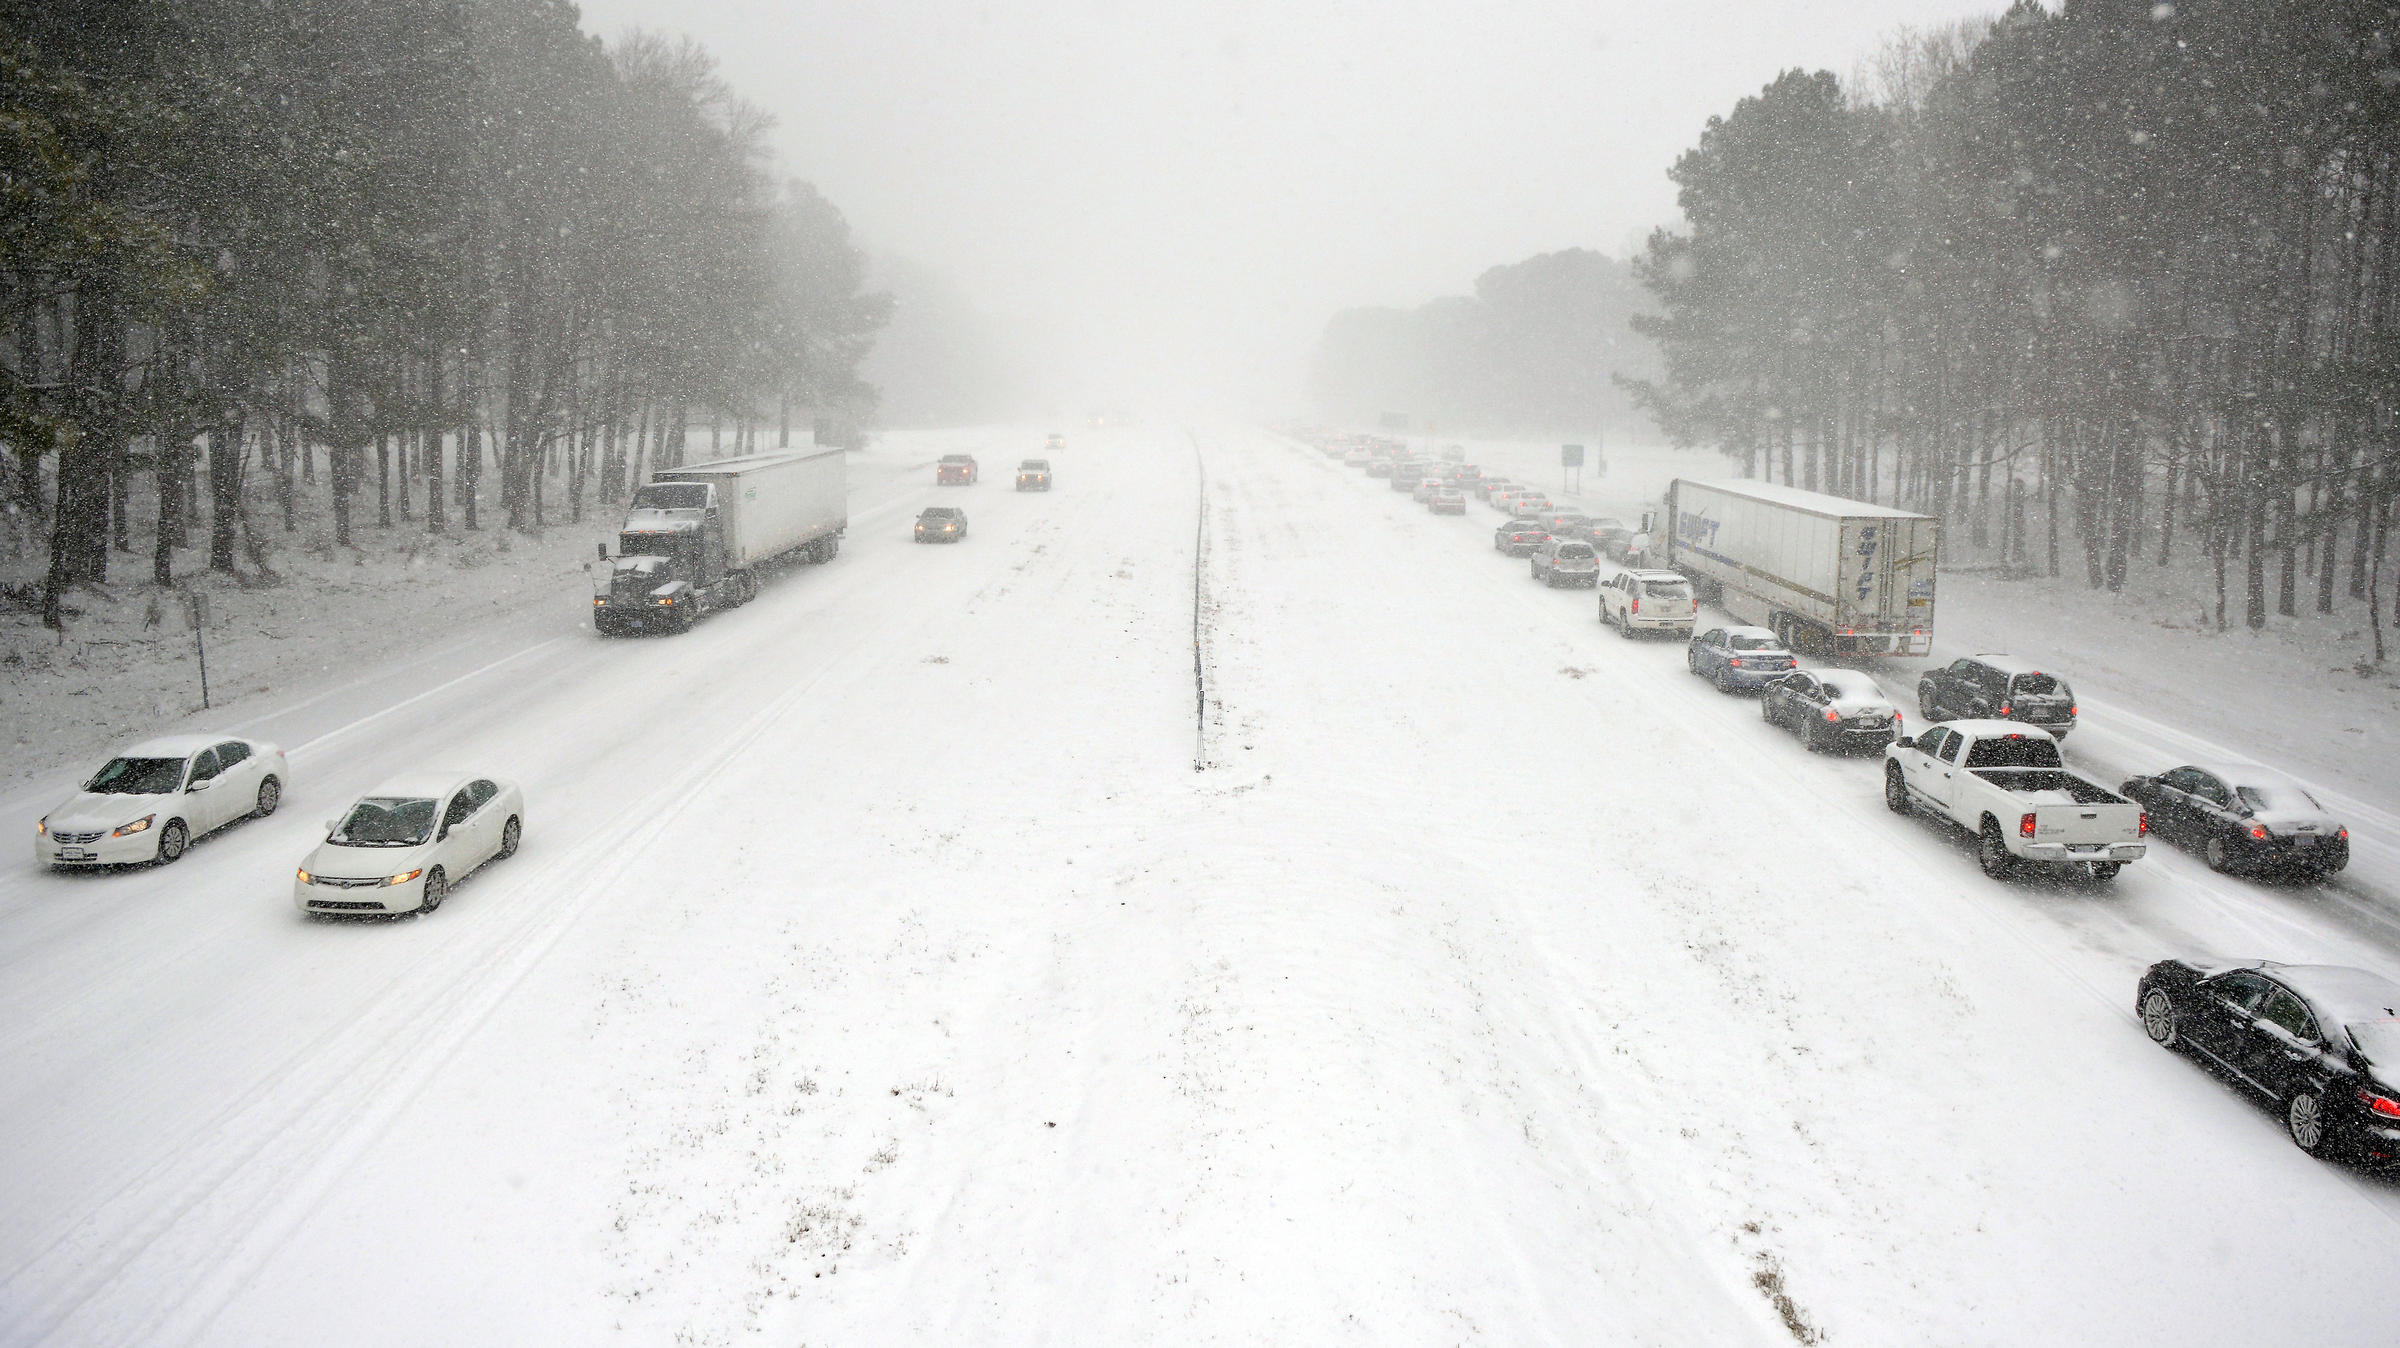 Winter Storm Paralyzes Roads In North Carolina, Despite